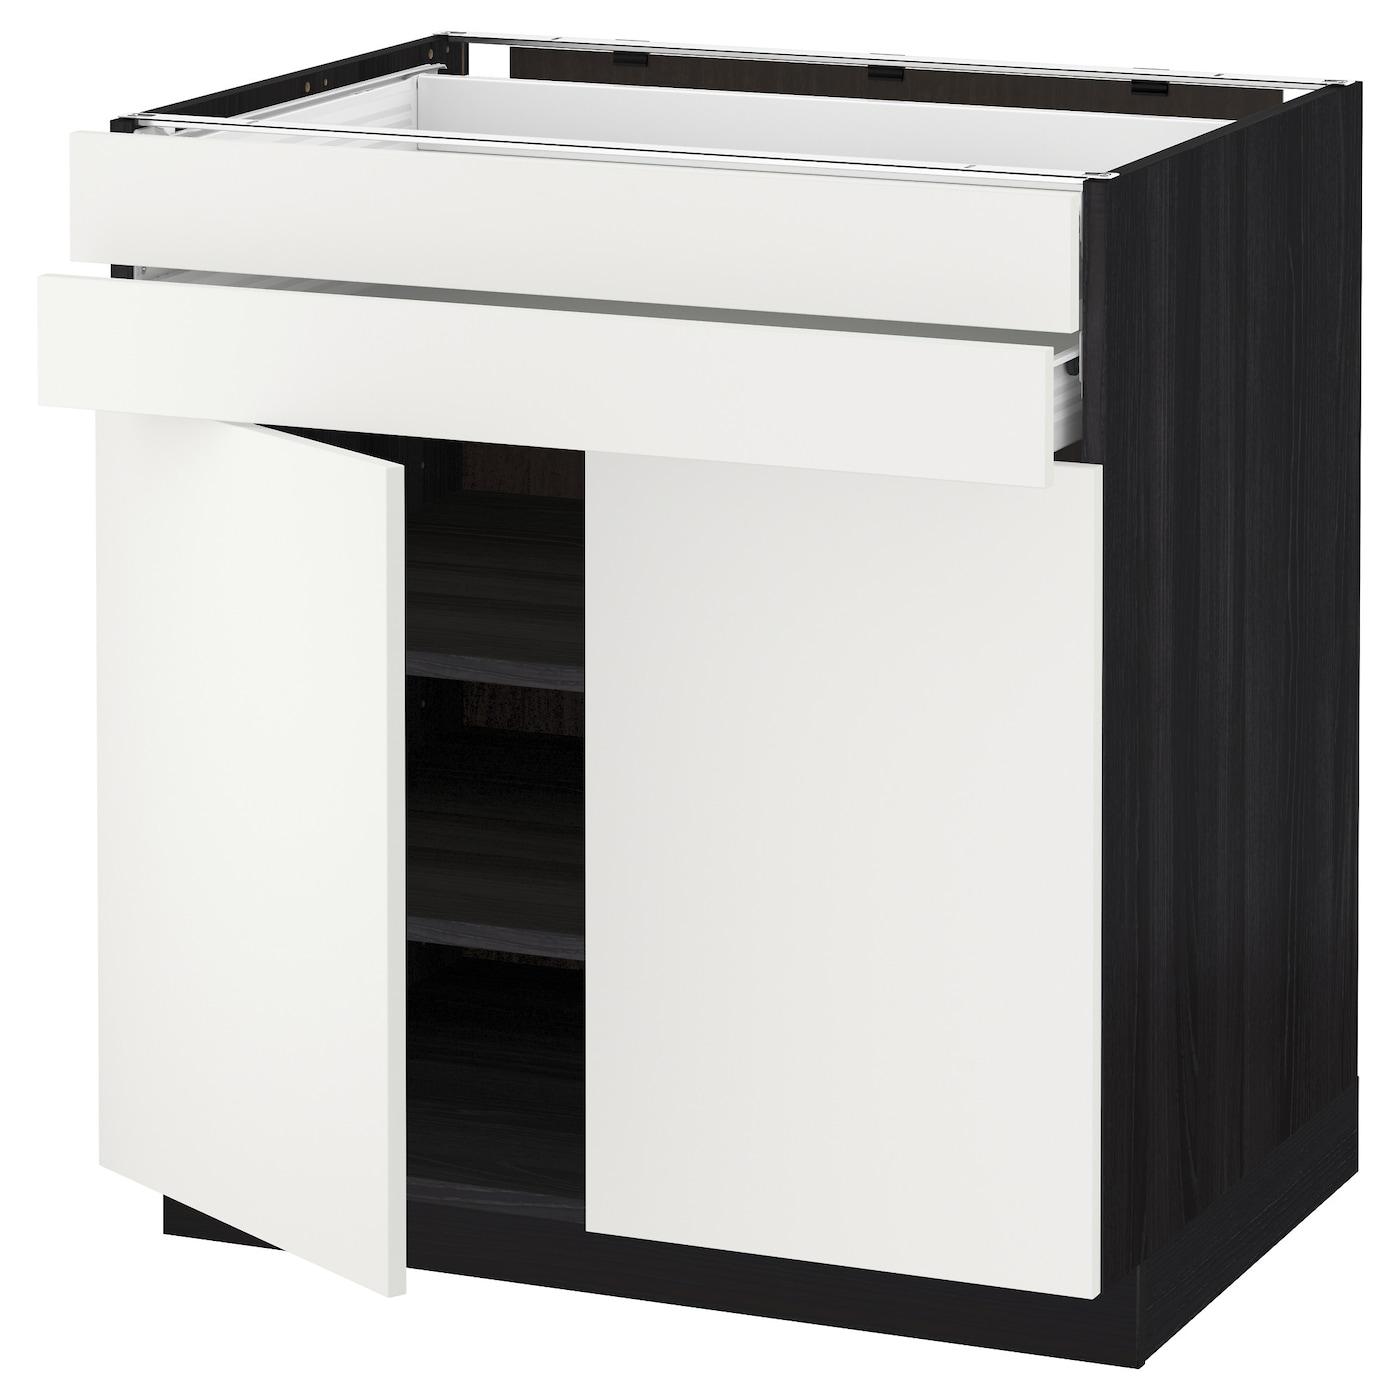 metod f rvara lt bas 2 portes 2 tiroirs noir h ggeby blanc 80 x 60 cm ikea. Black Bedroom Furniture Sets. Home Design Ideas